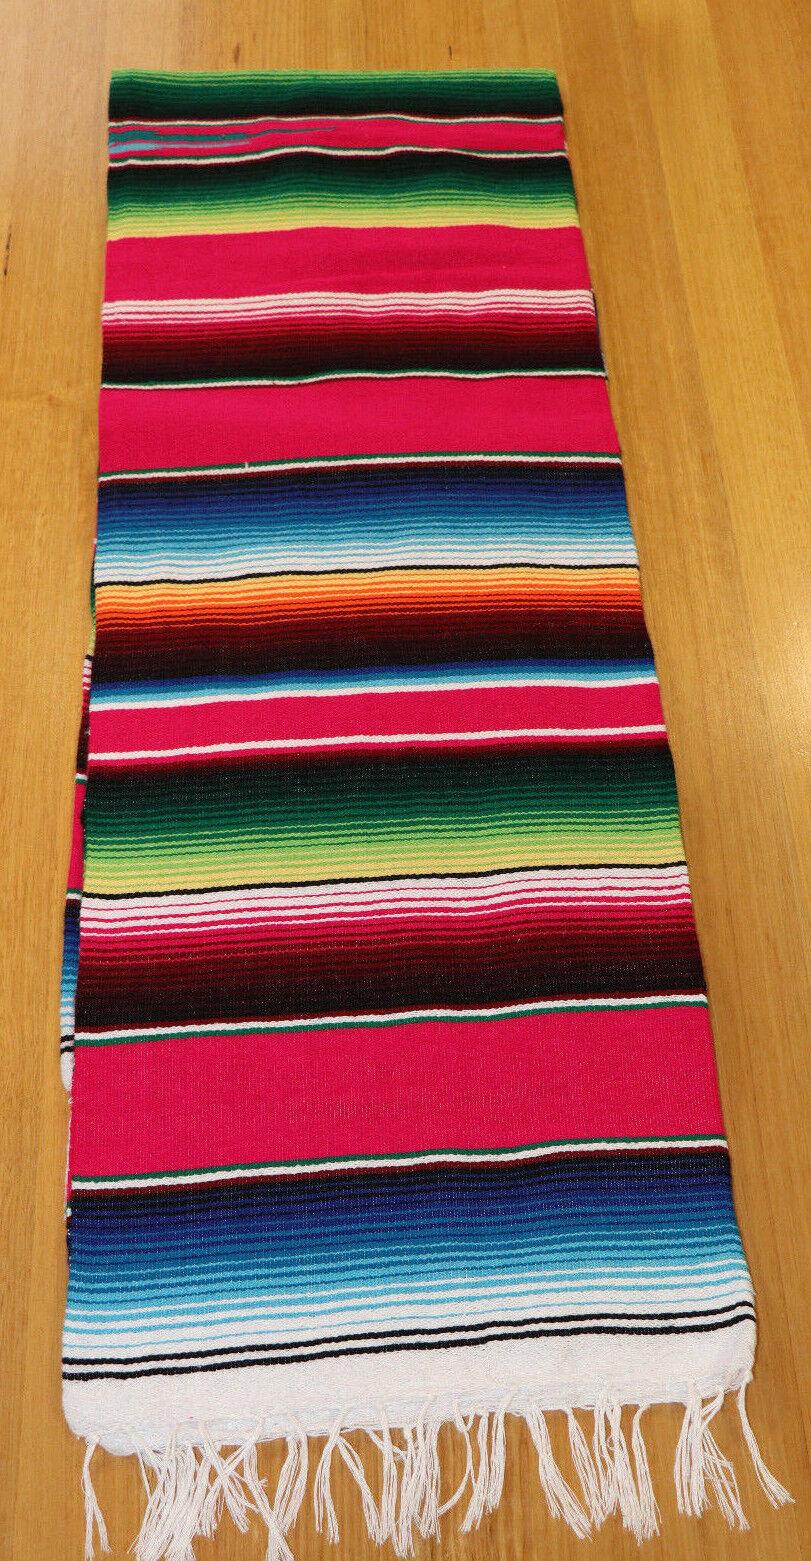 Mexican Sarape Pink, Blanket, Rug, Picnic, Throw, Tablecloth, Hot Rod, Yoga